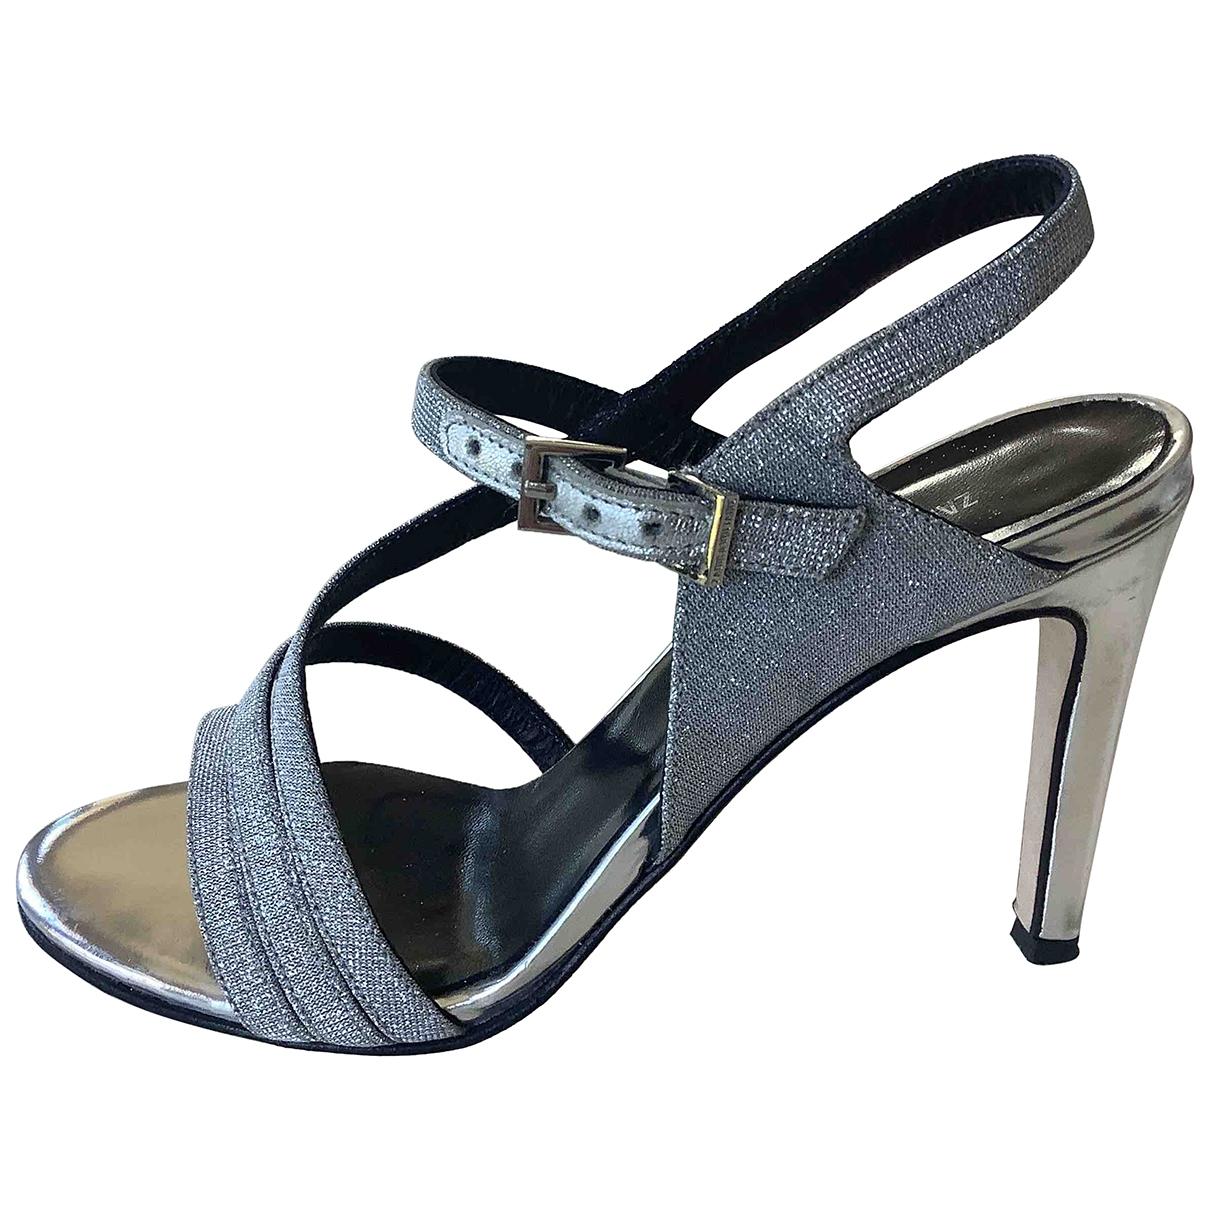 Zadig & Voltaire Spring Summer 2019 Silver Glitter Sandals for Women 36 EU